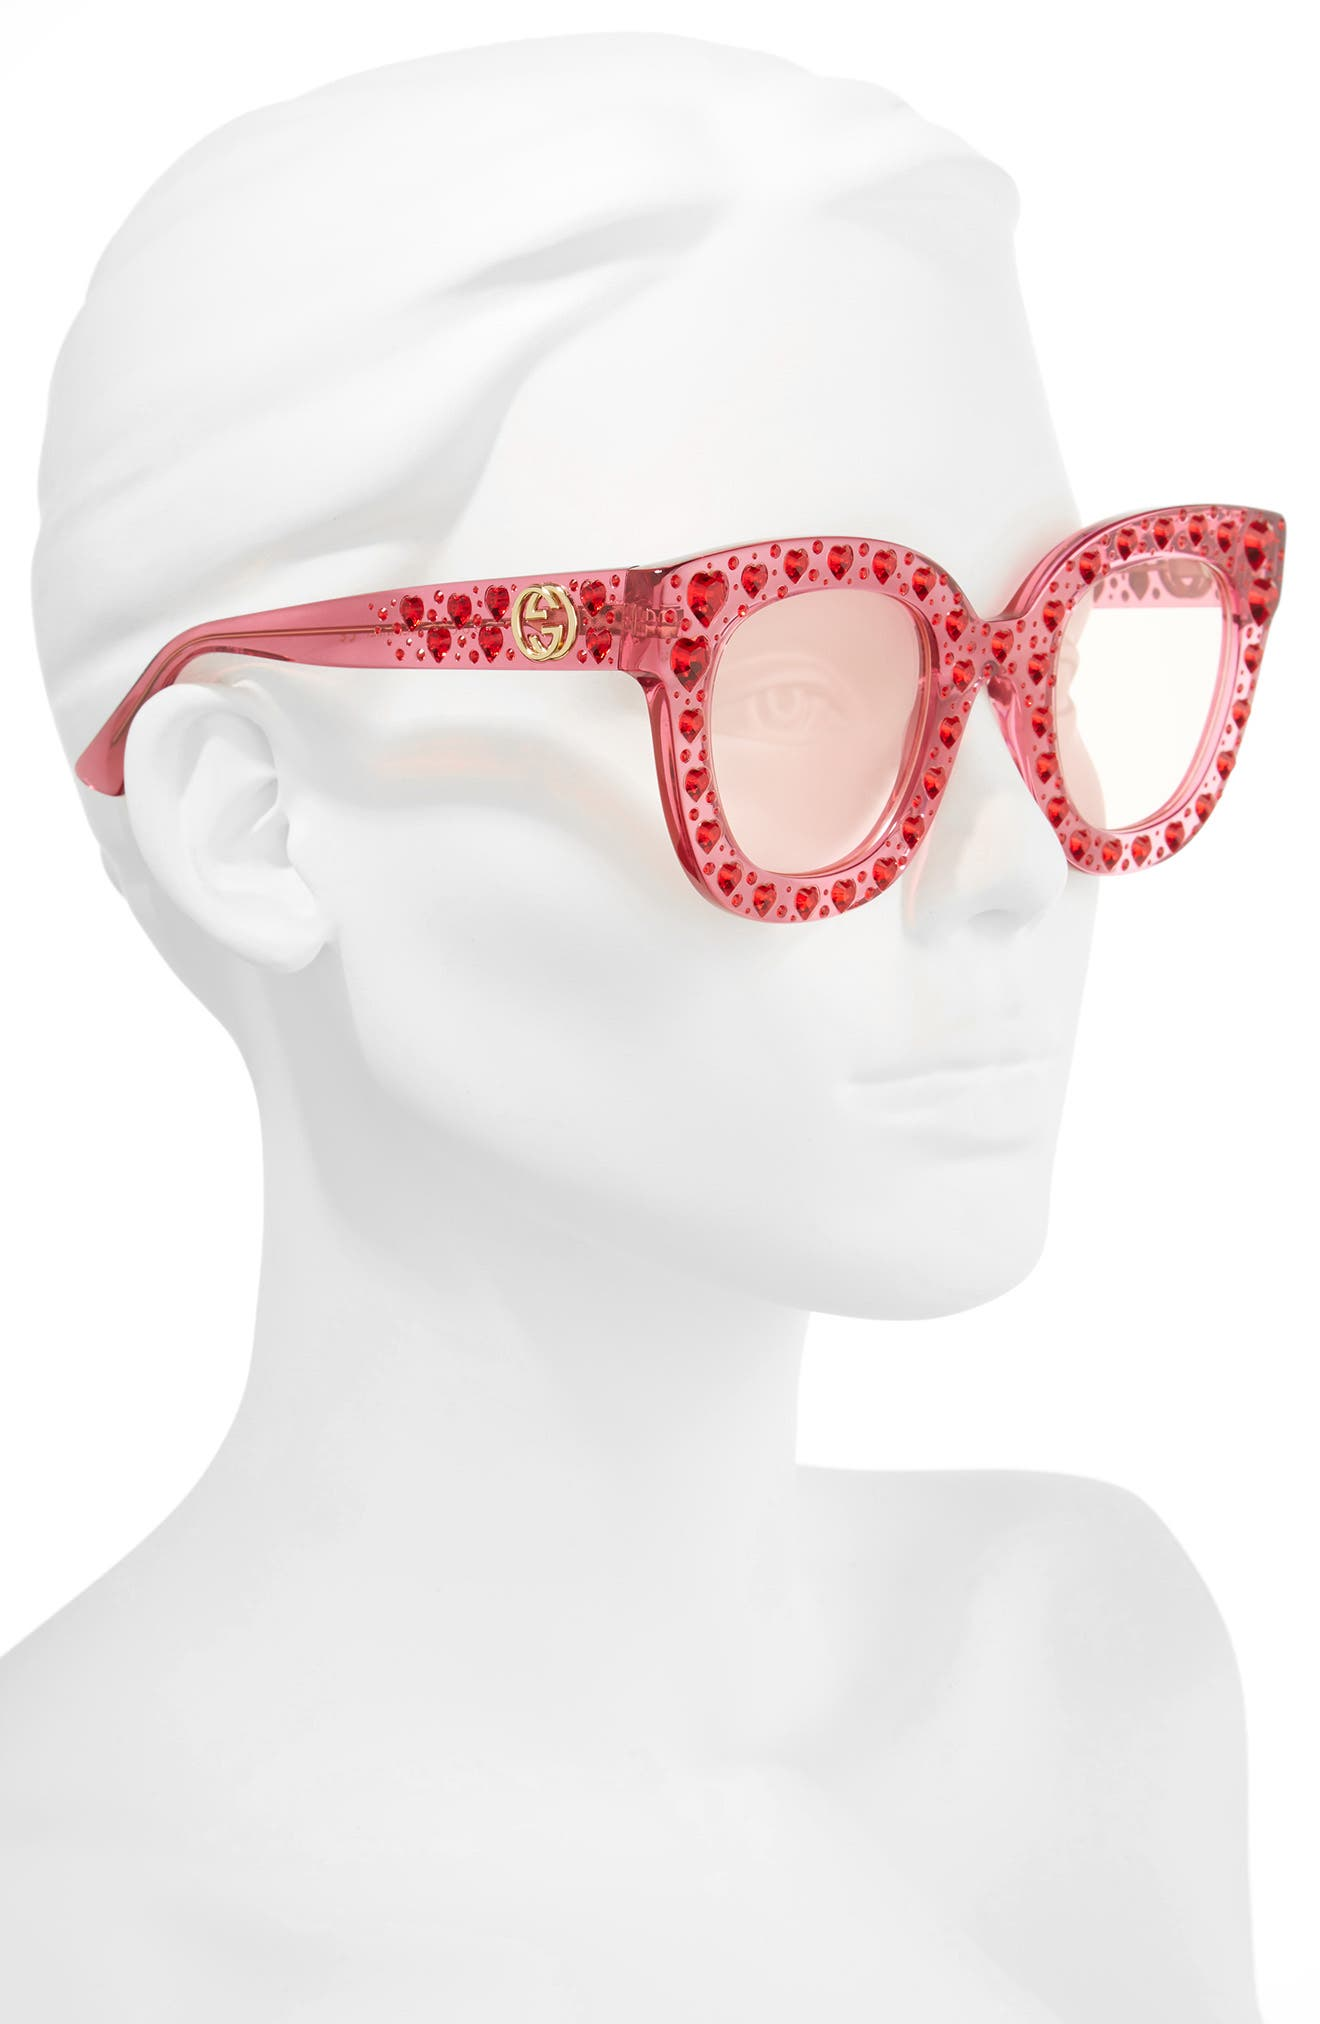 49mm Crystal Heart Sunglasses,                             Alternate thumbnail 2, color,                             676